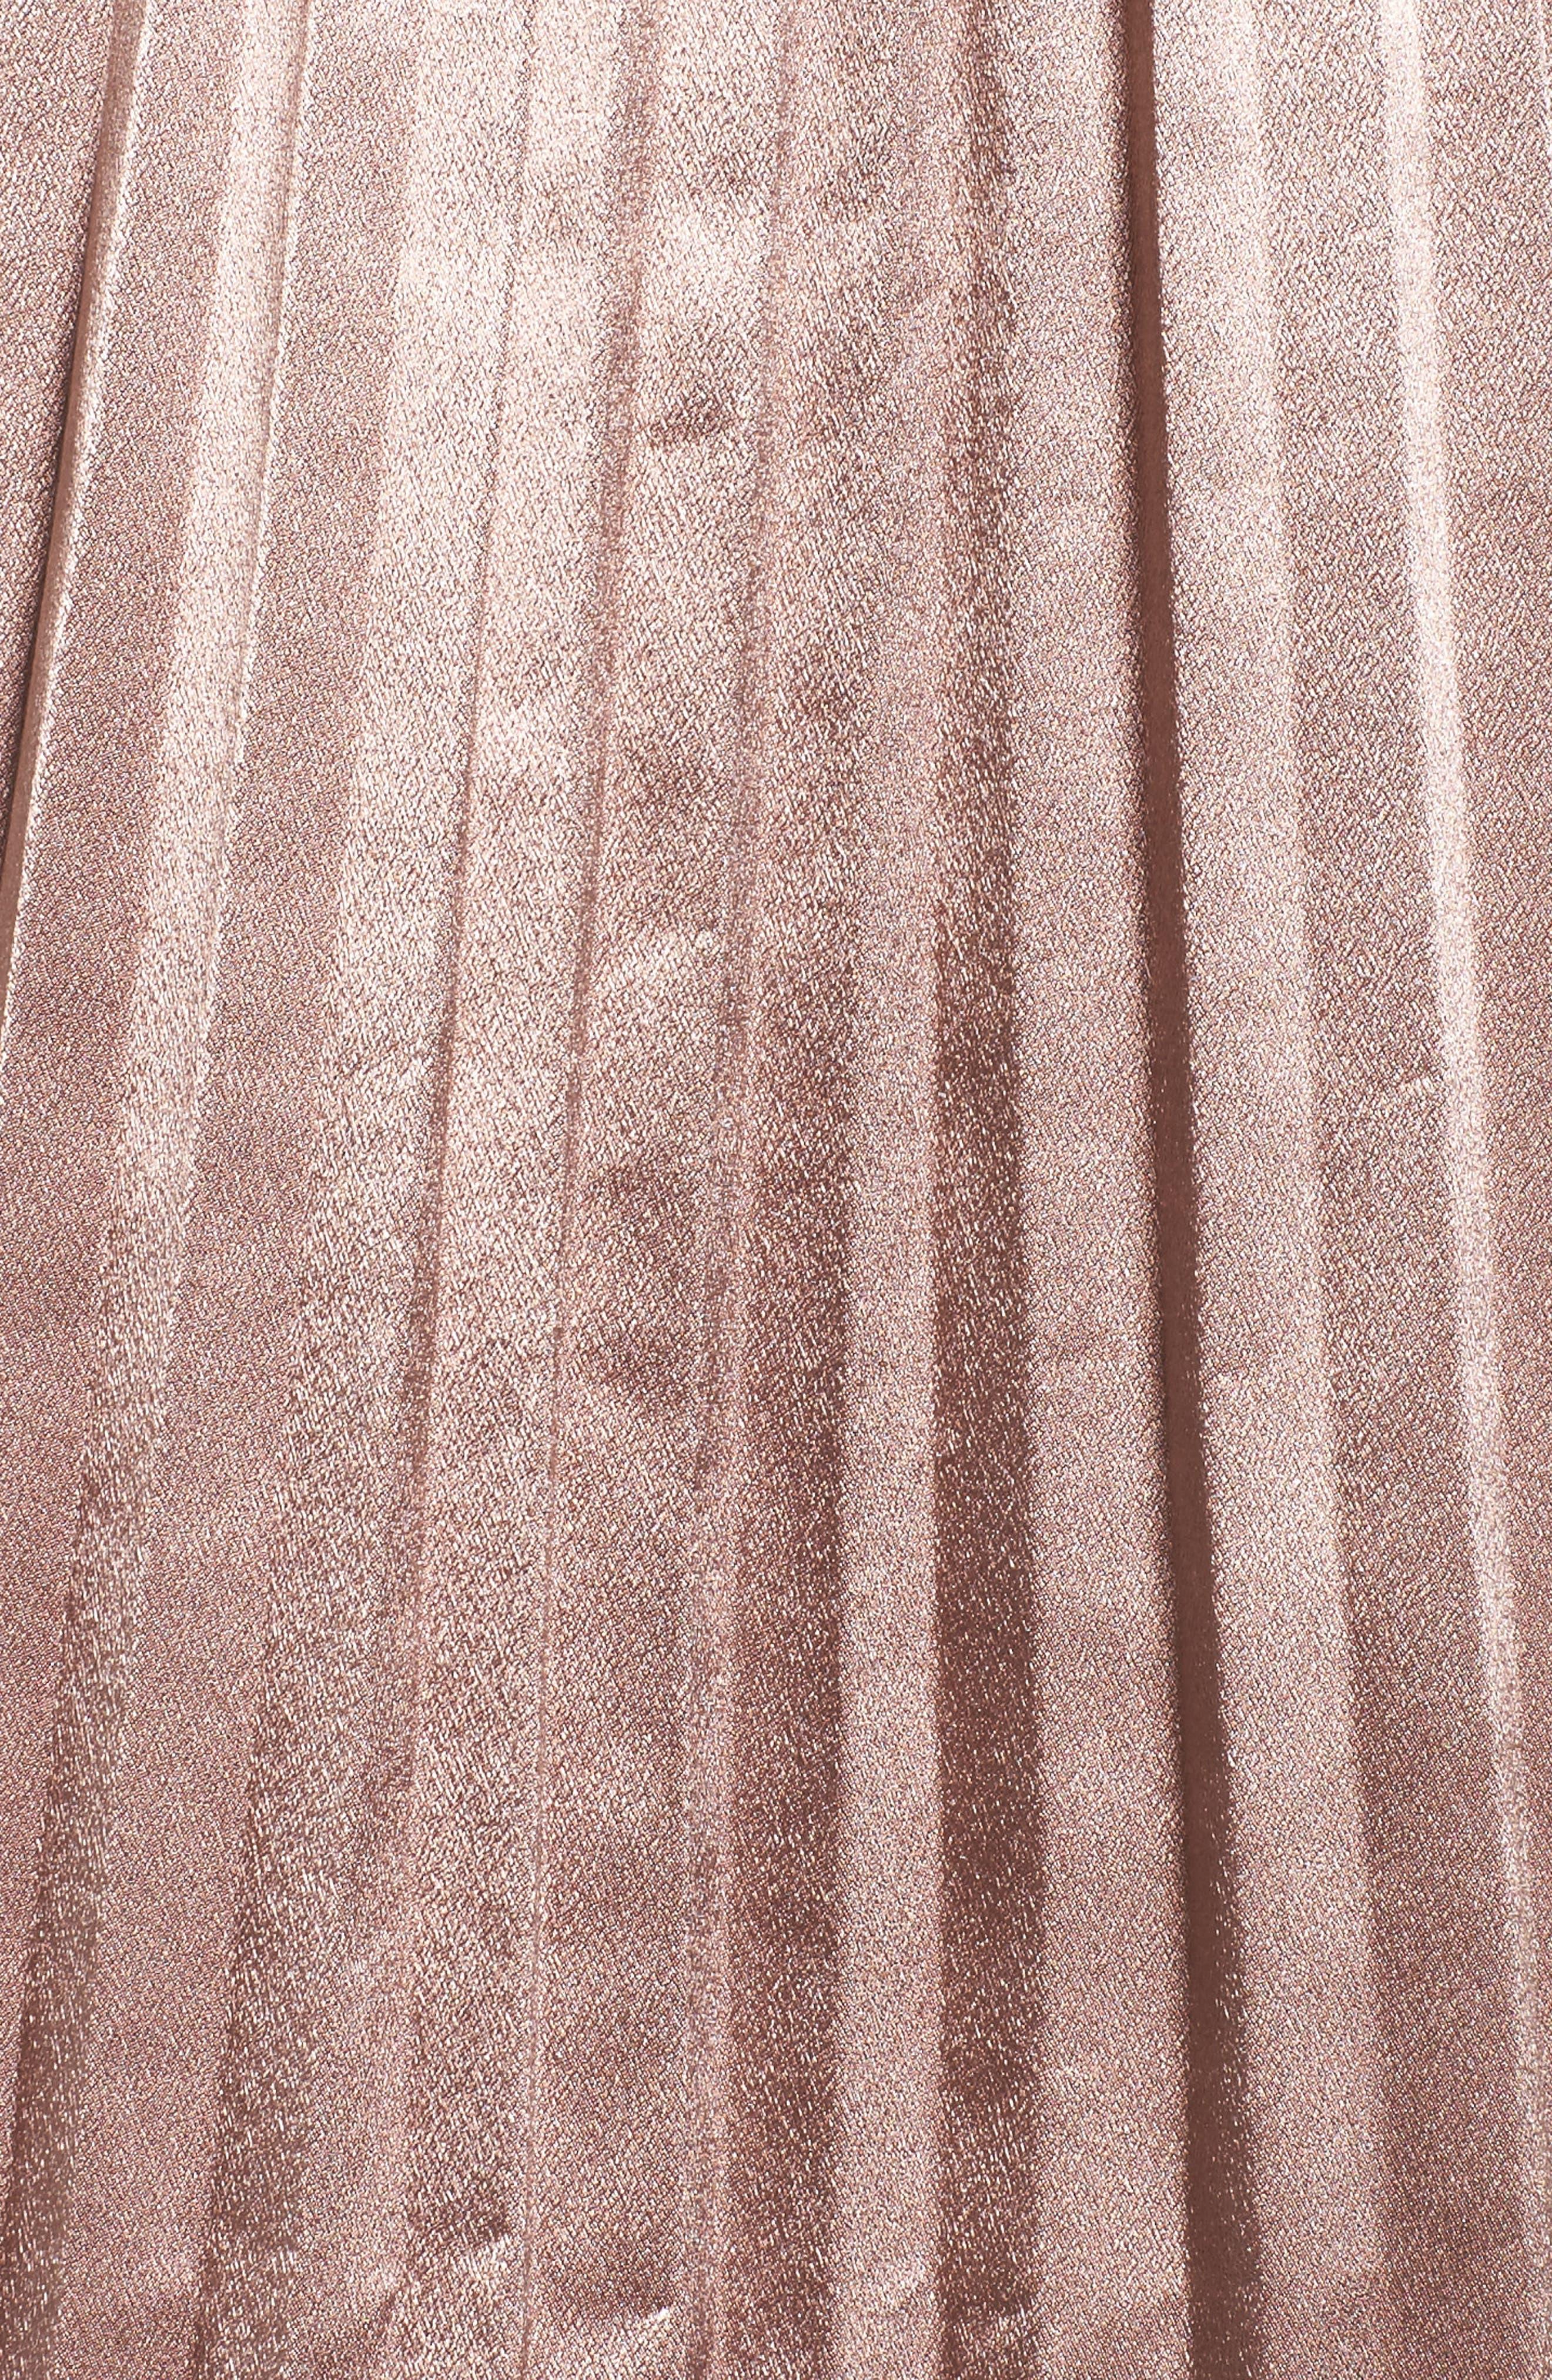 Pleat Metallic Skirt,                             Alternate thumbnail 5, color,                             650